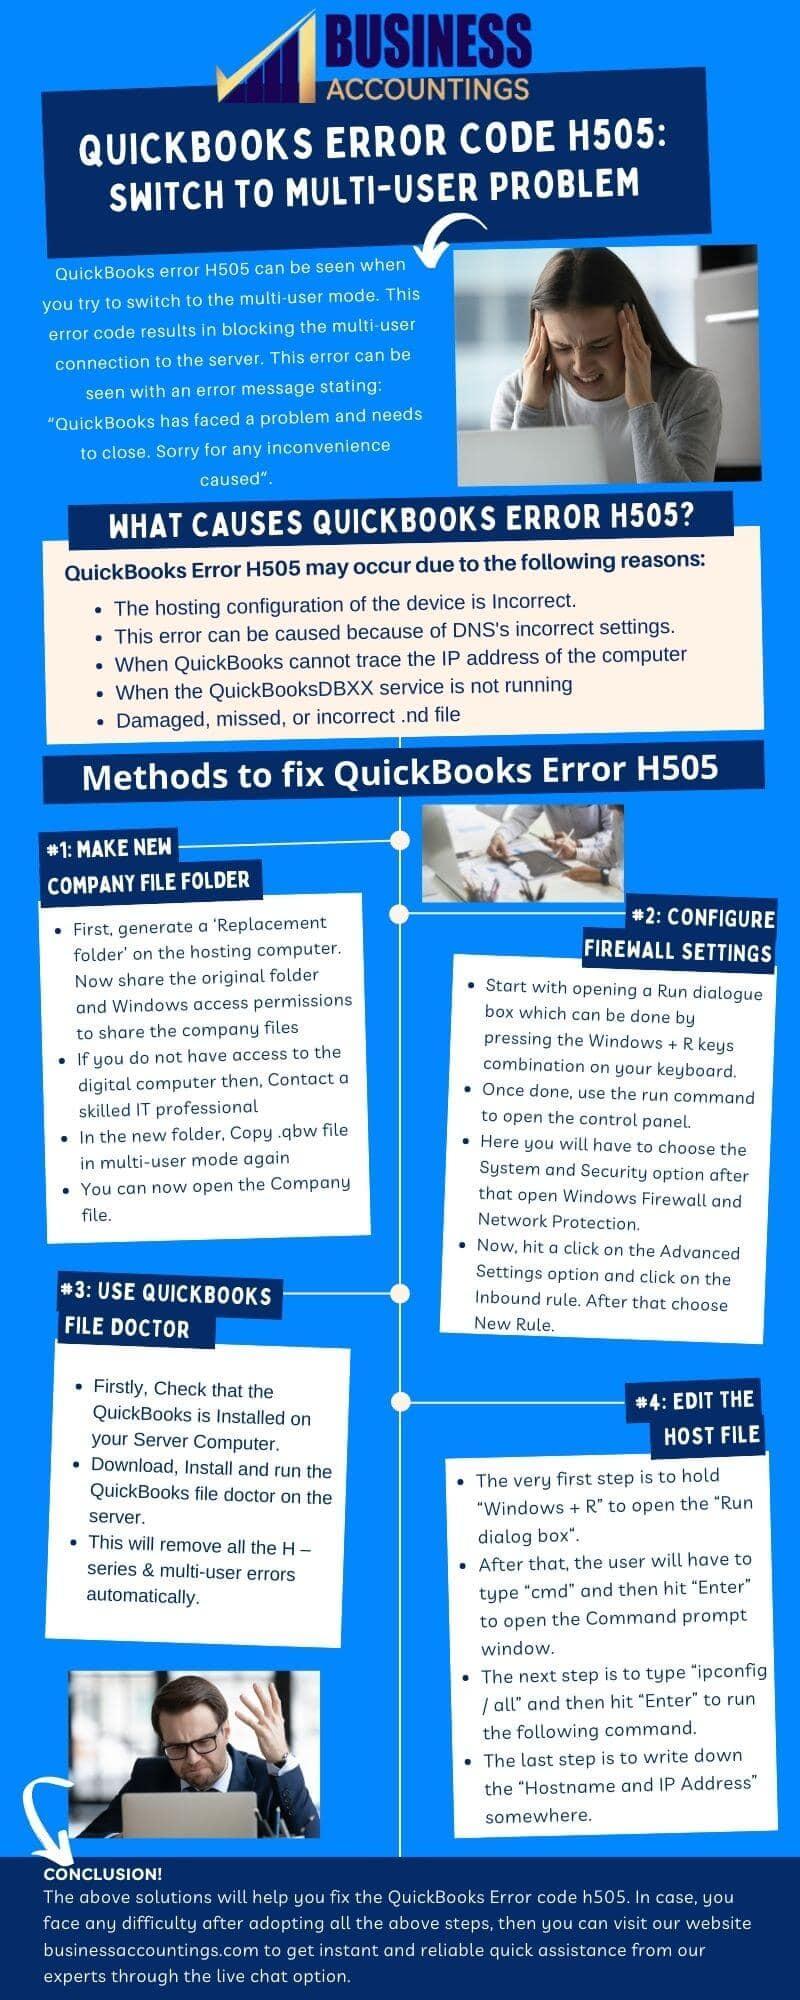 Infographics to Fix QuickBooks Error Code H505